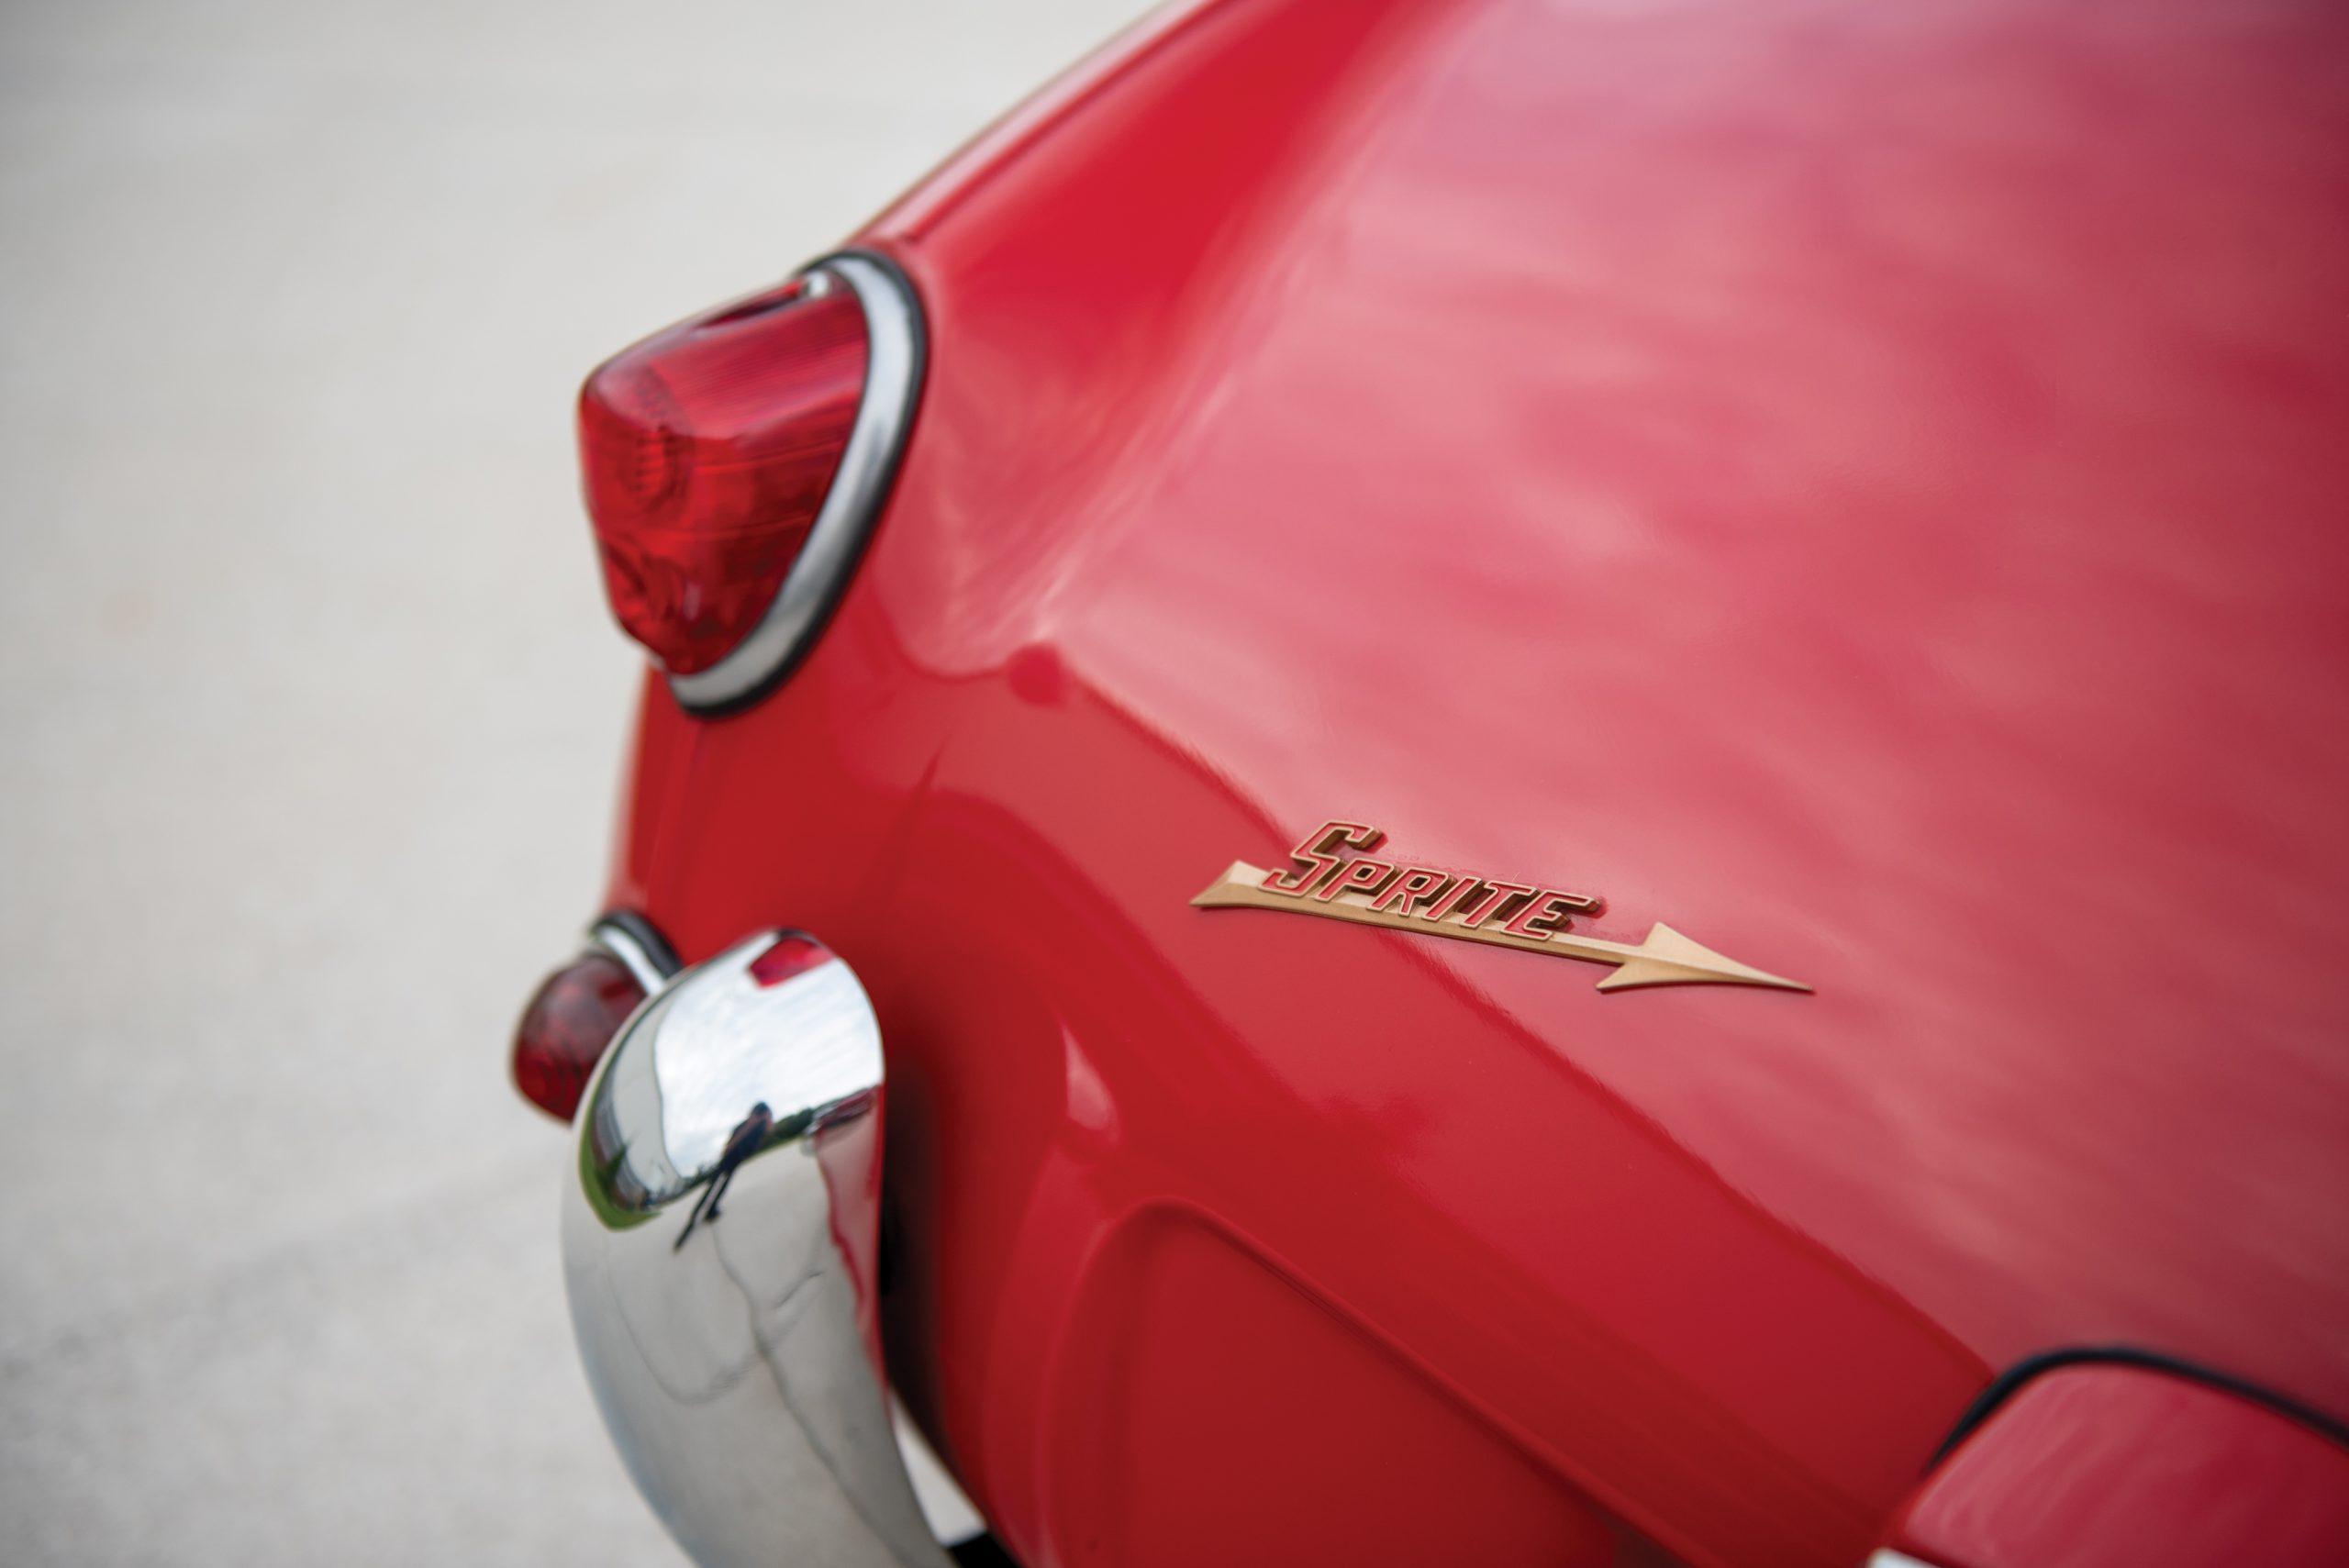 1959 Austin Healey Sprite Bugeye rear badge